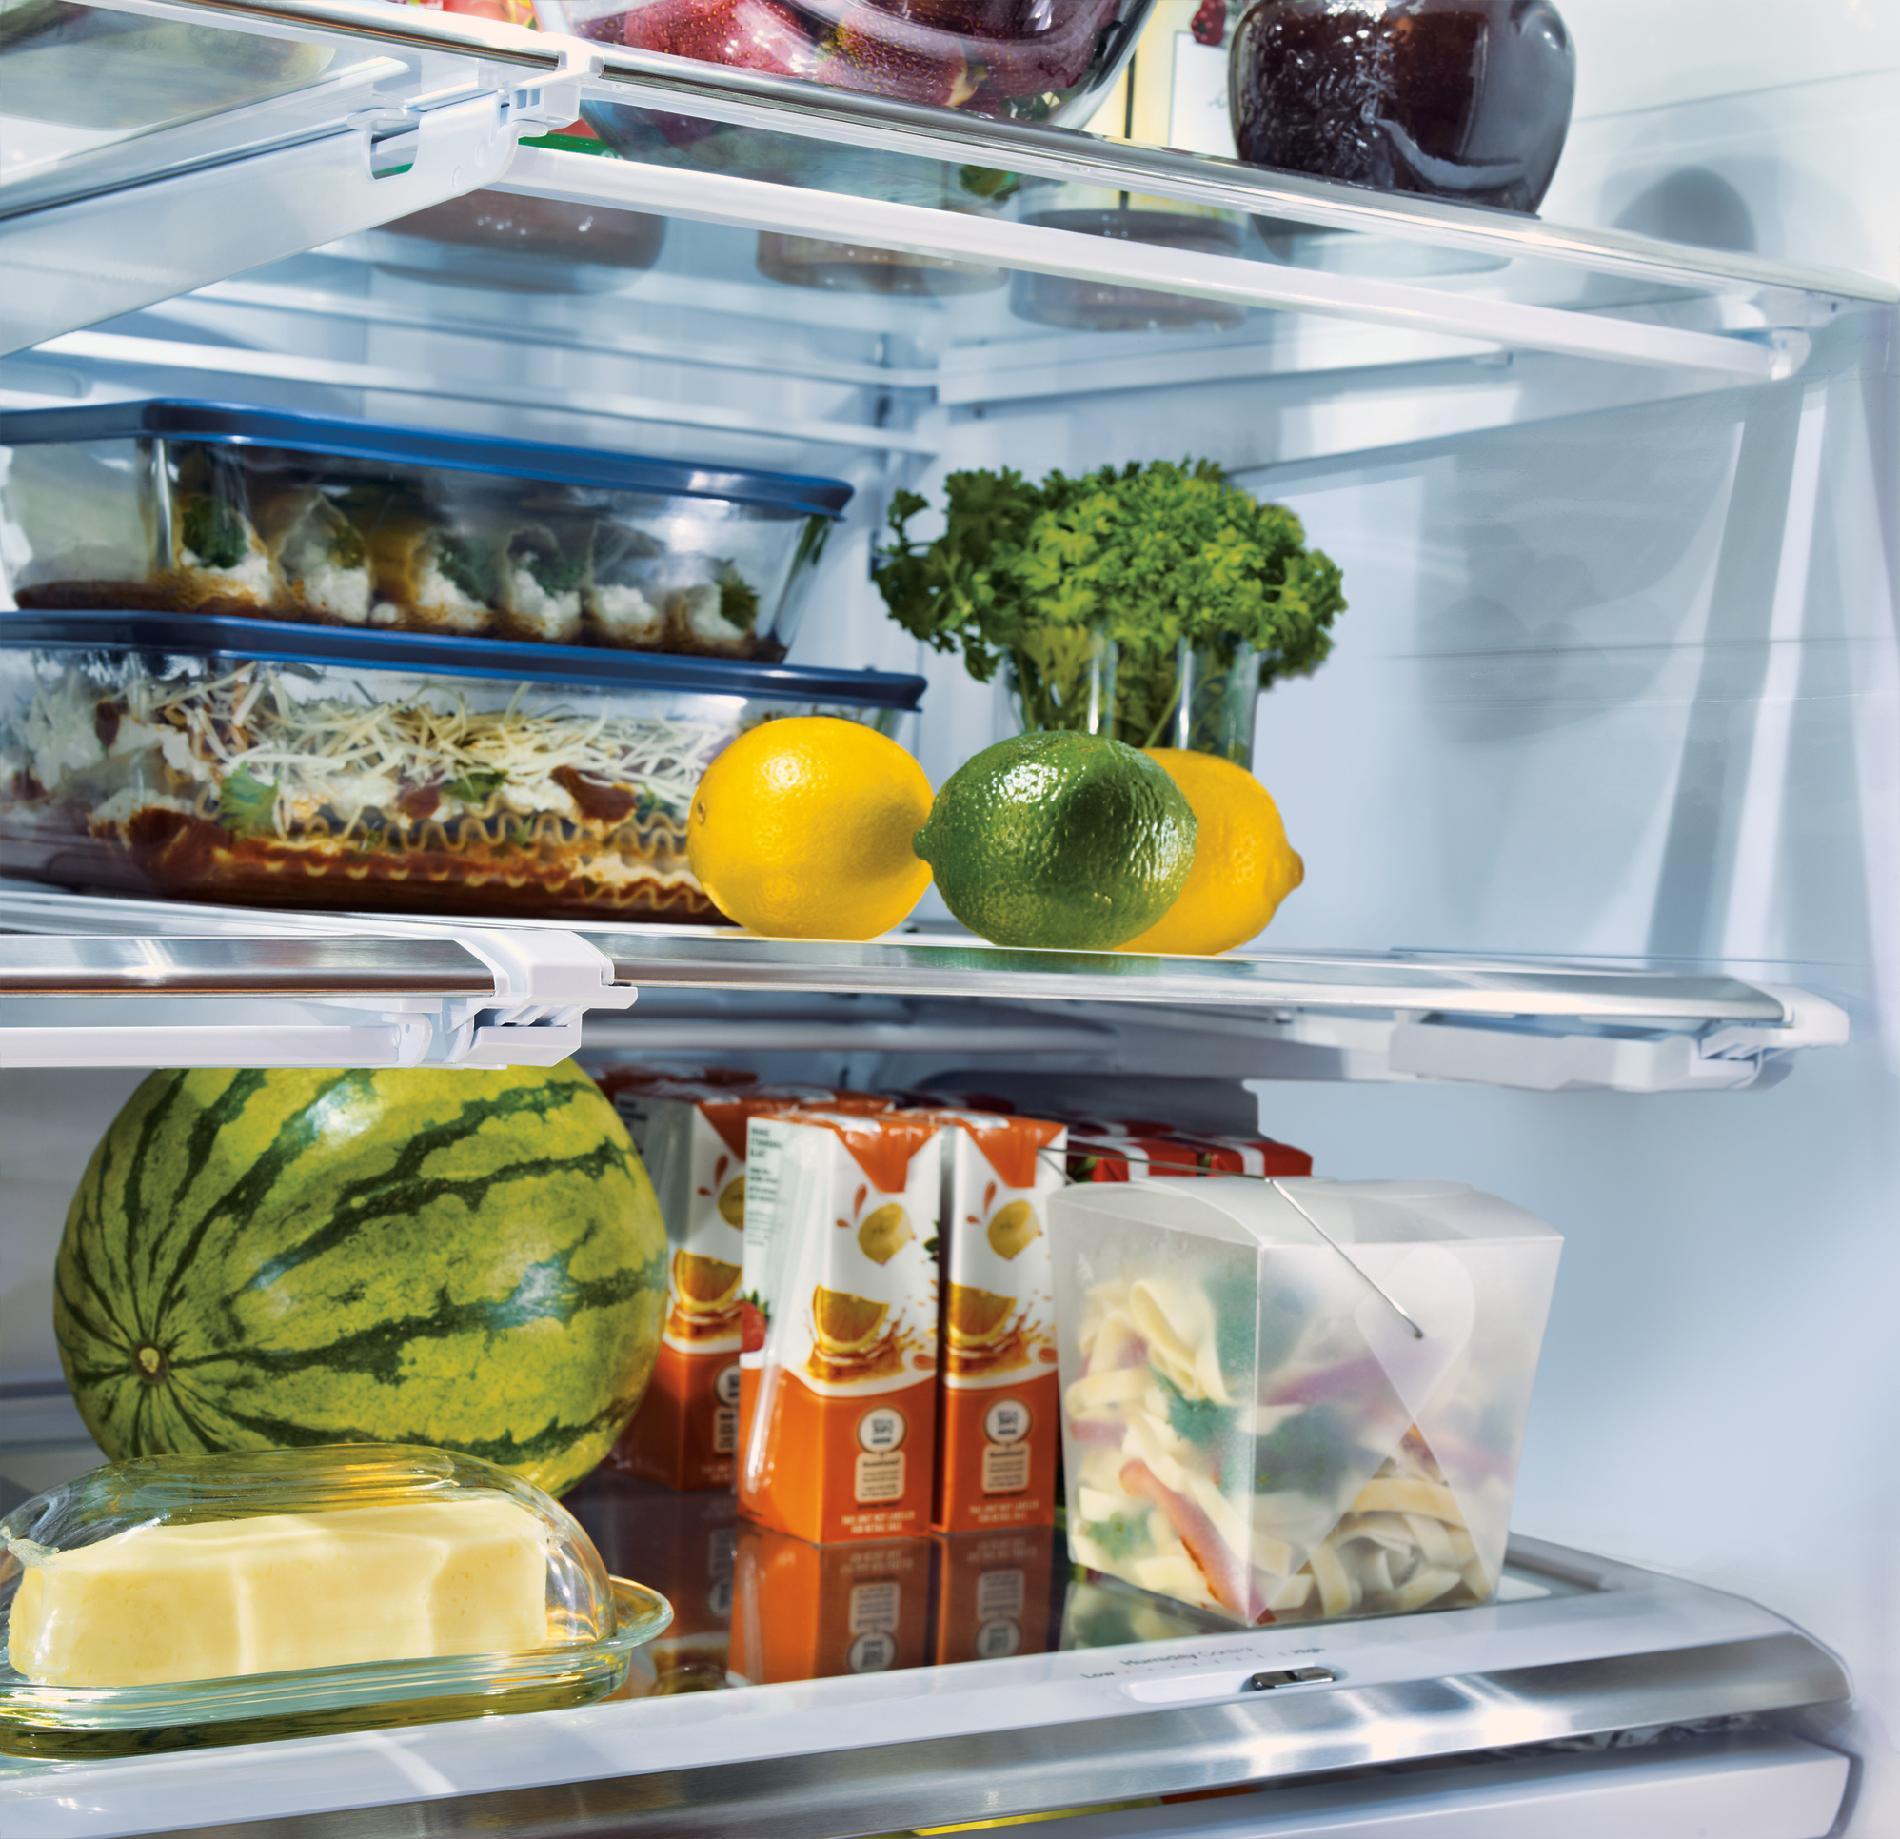 Samsung RF31FMEDBSR 29.7 cu. ft. 4-Door Refrigerator - Stainless Steel